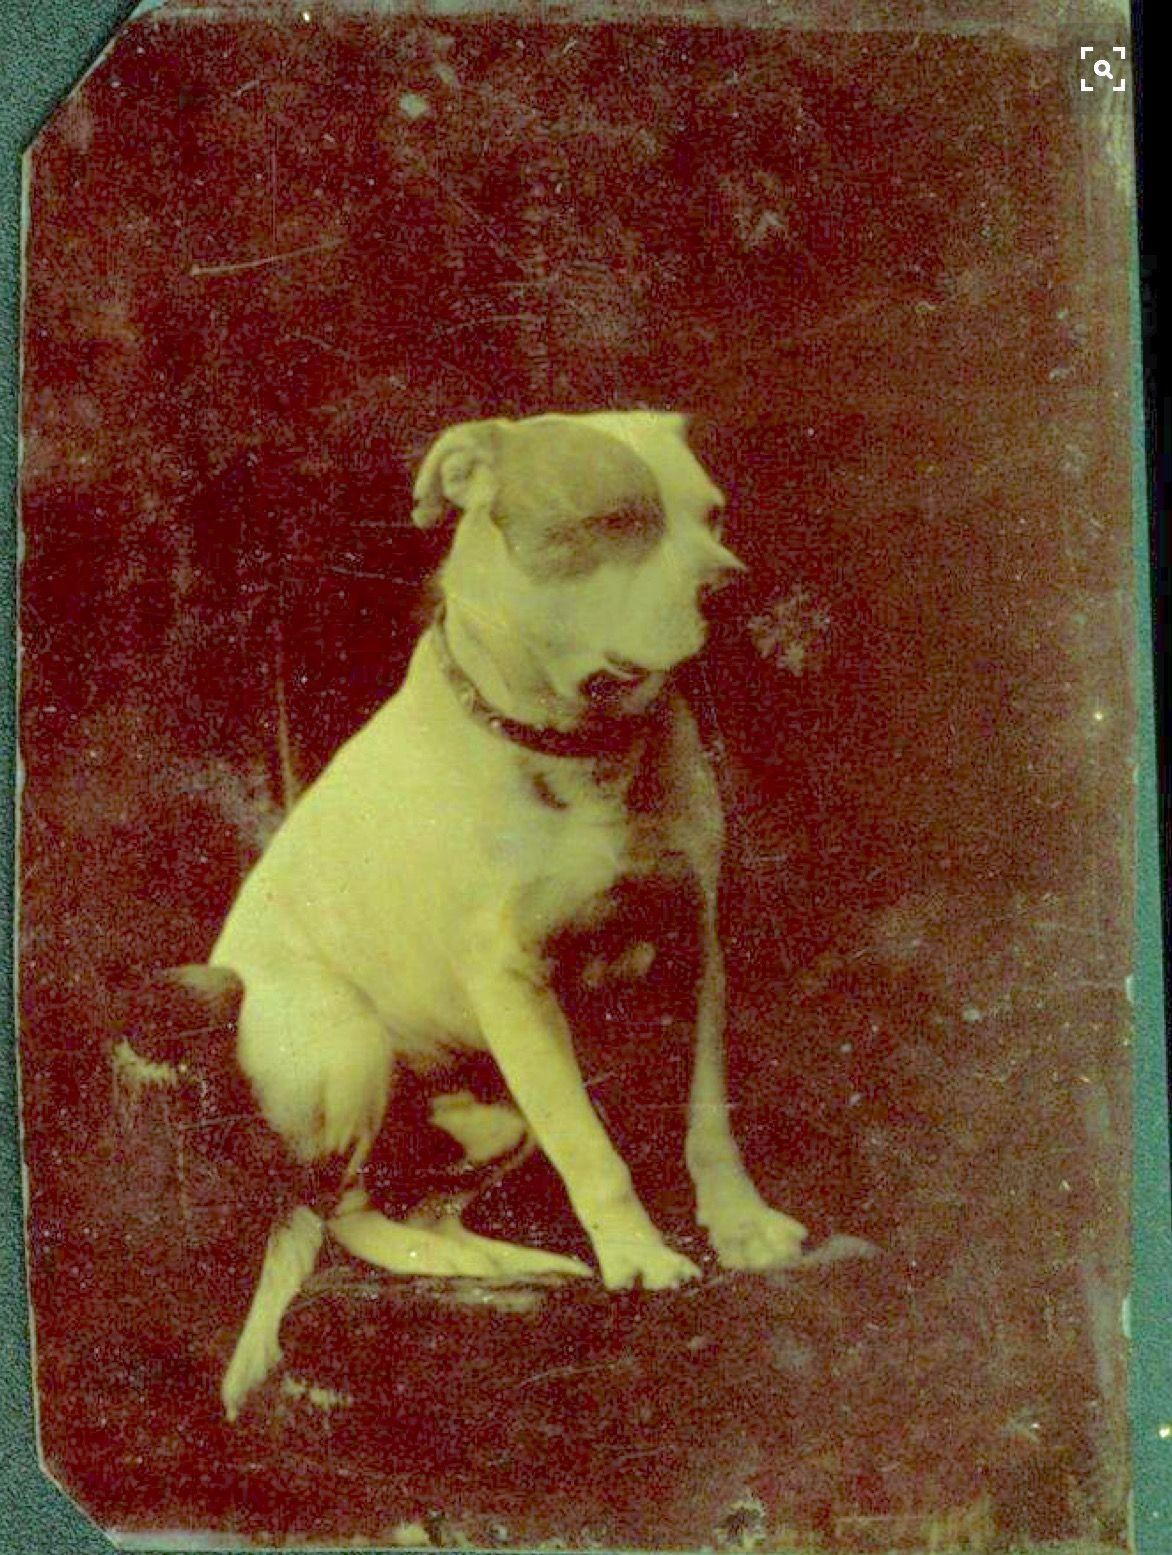 Pin By Rigorously Thinking On Photos Nanny Dog Vintage Dog